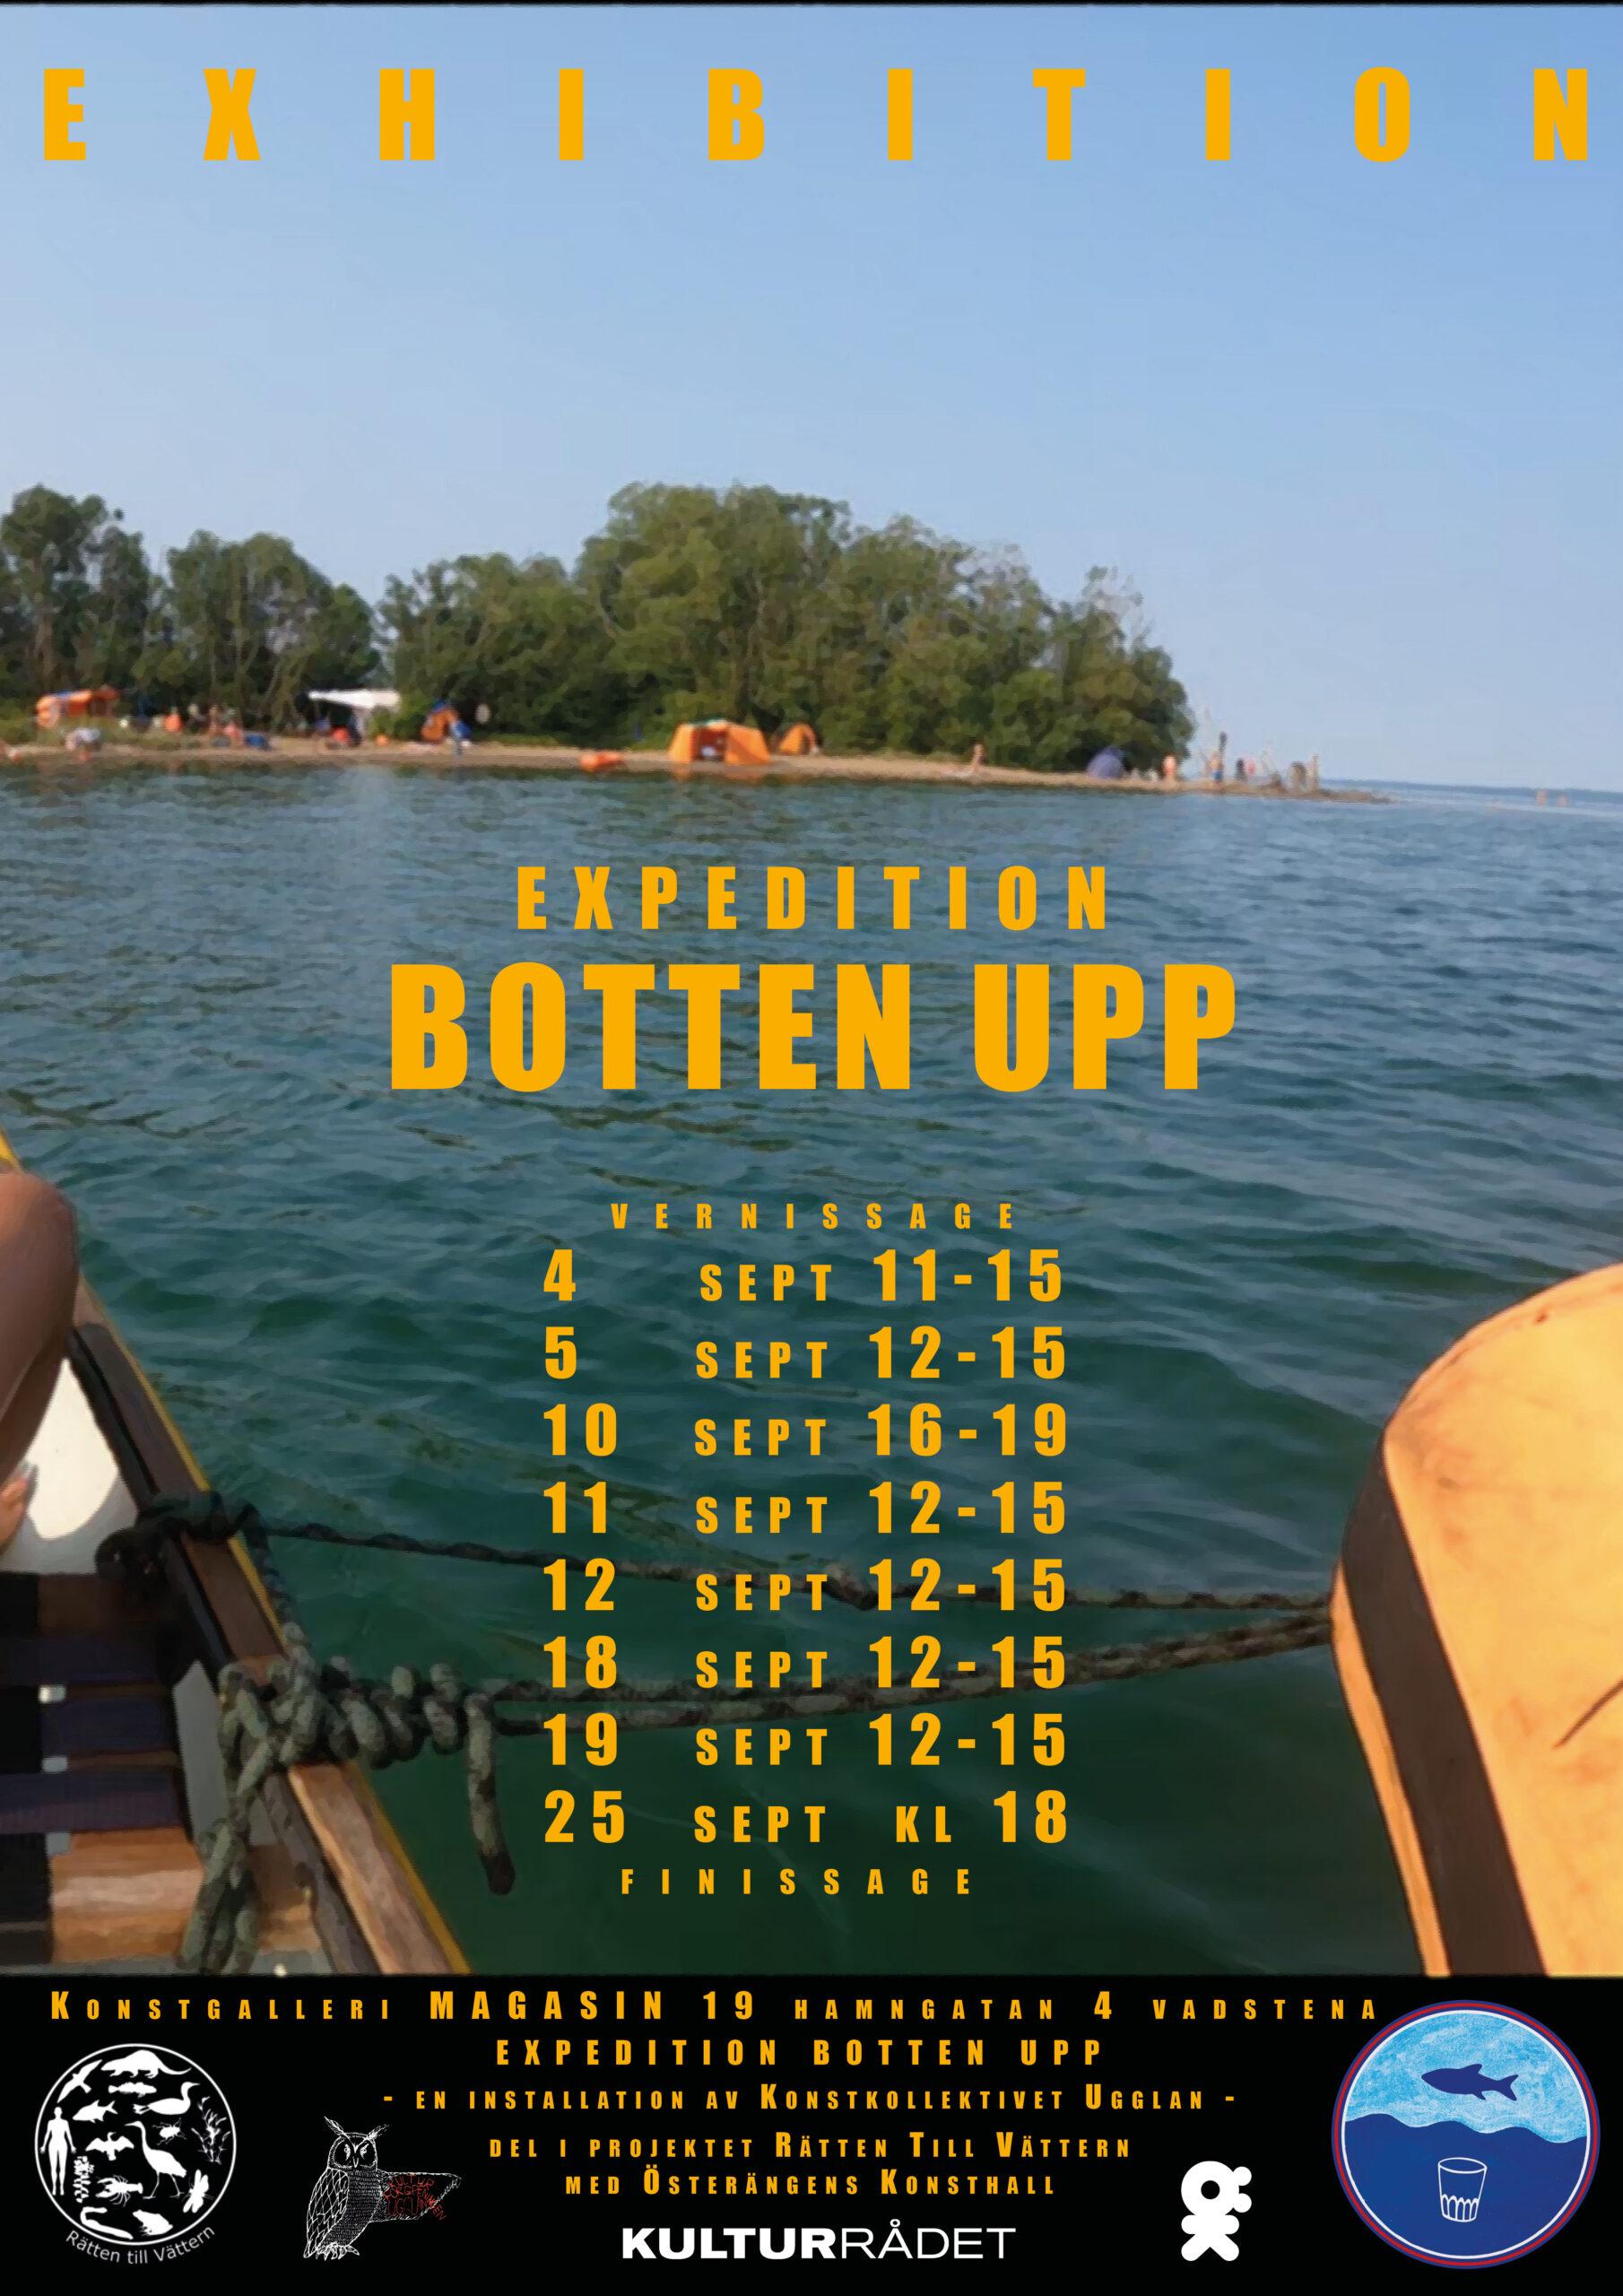 Expedition BOTTEN UPP  Dag 59 - Exhibition BOTTEN UPP